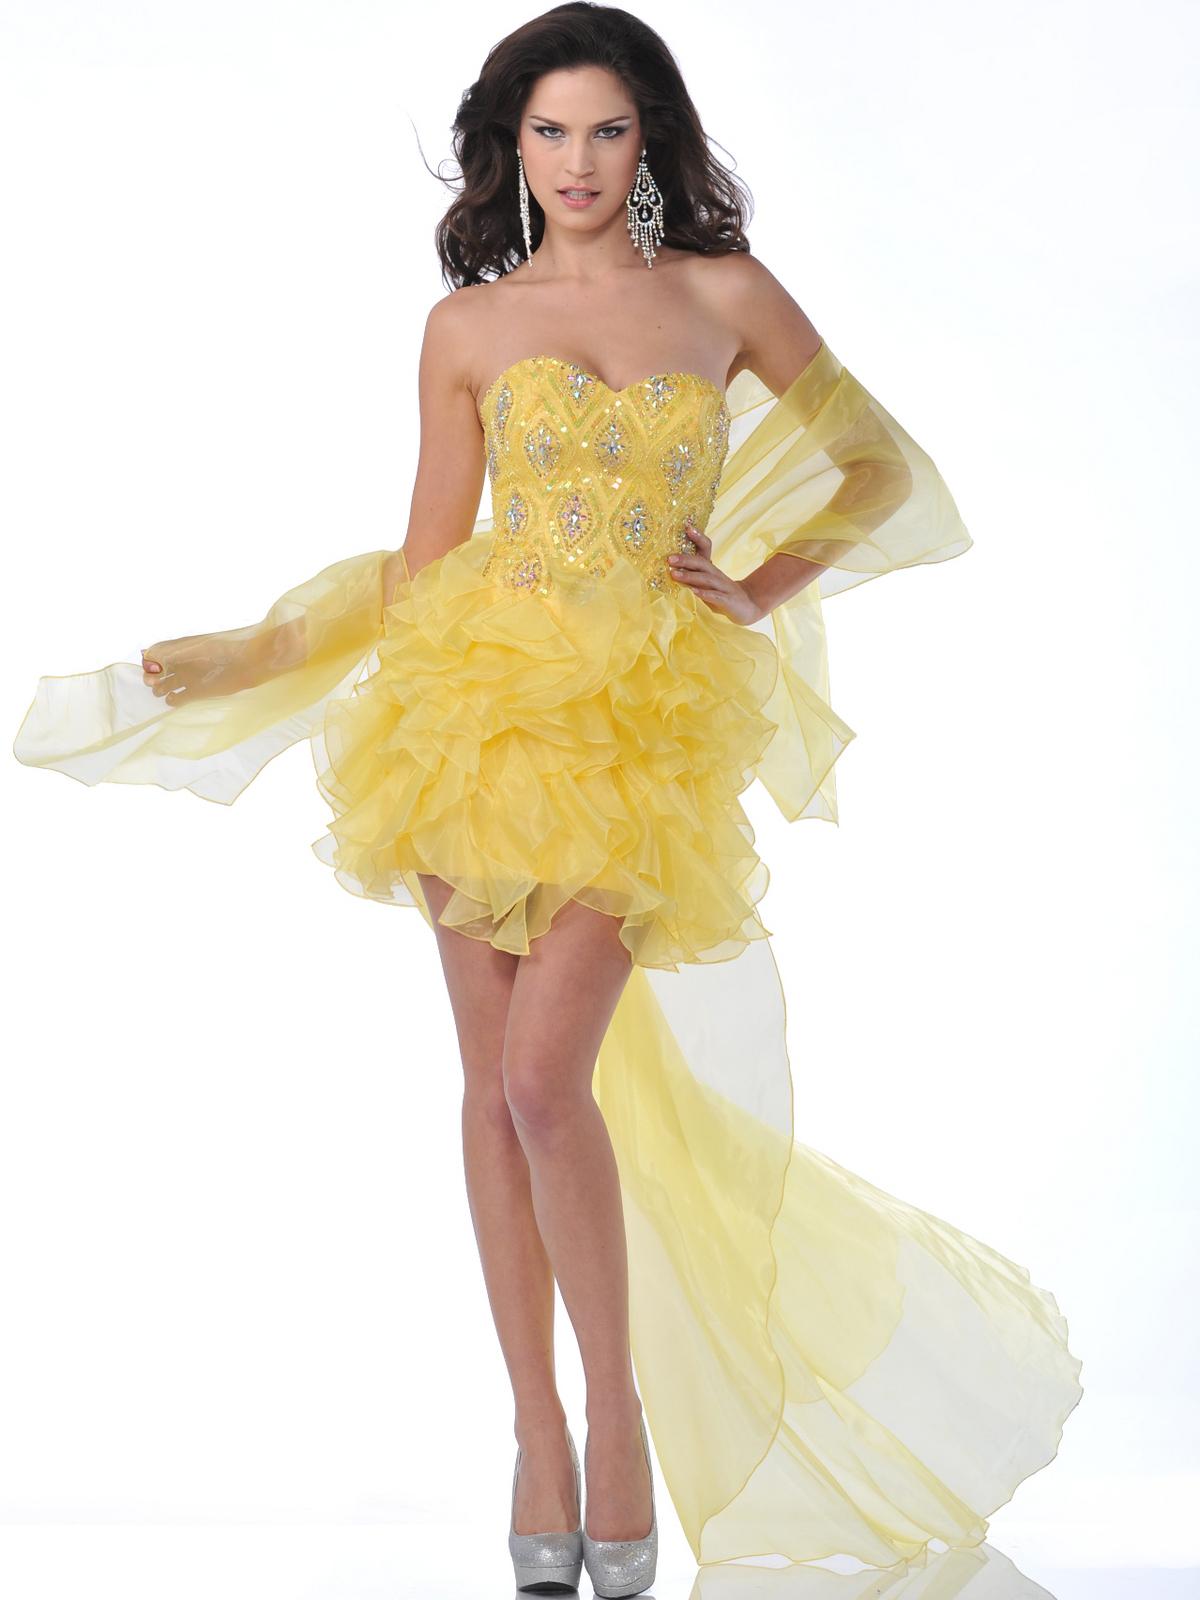 Strapless Beaded Organza Ruffle Short Prom Dress Sung